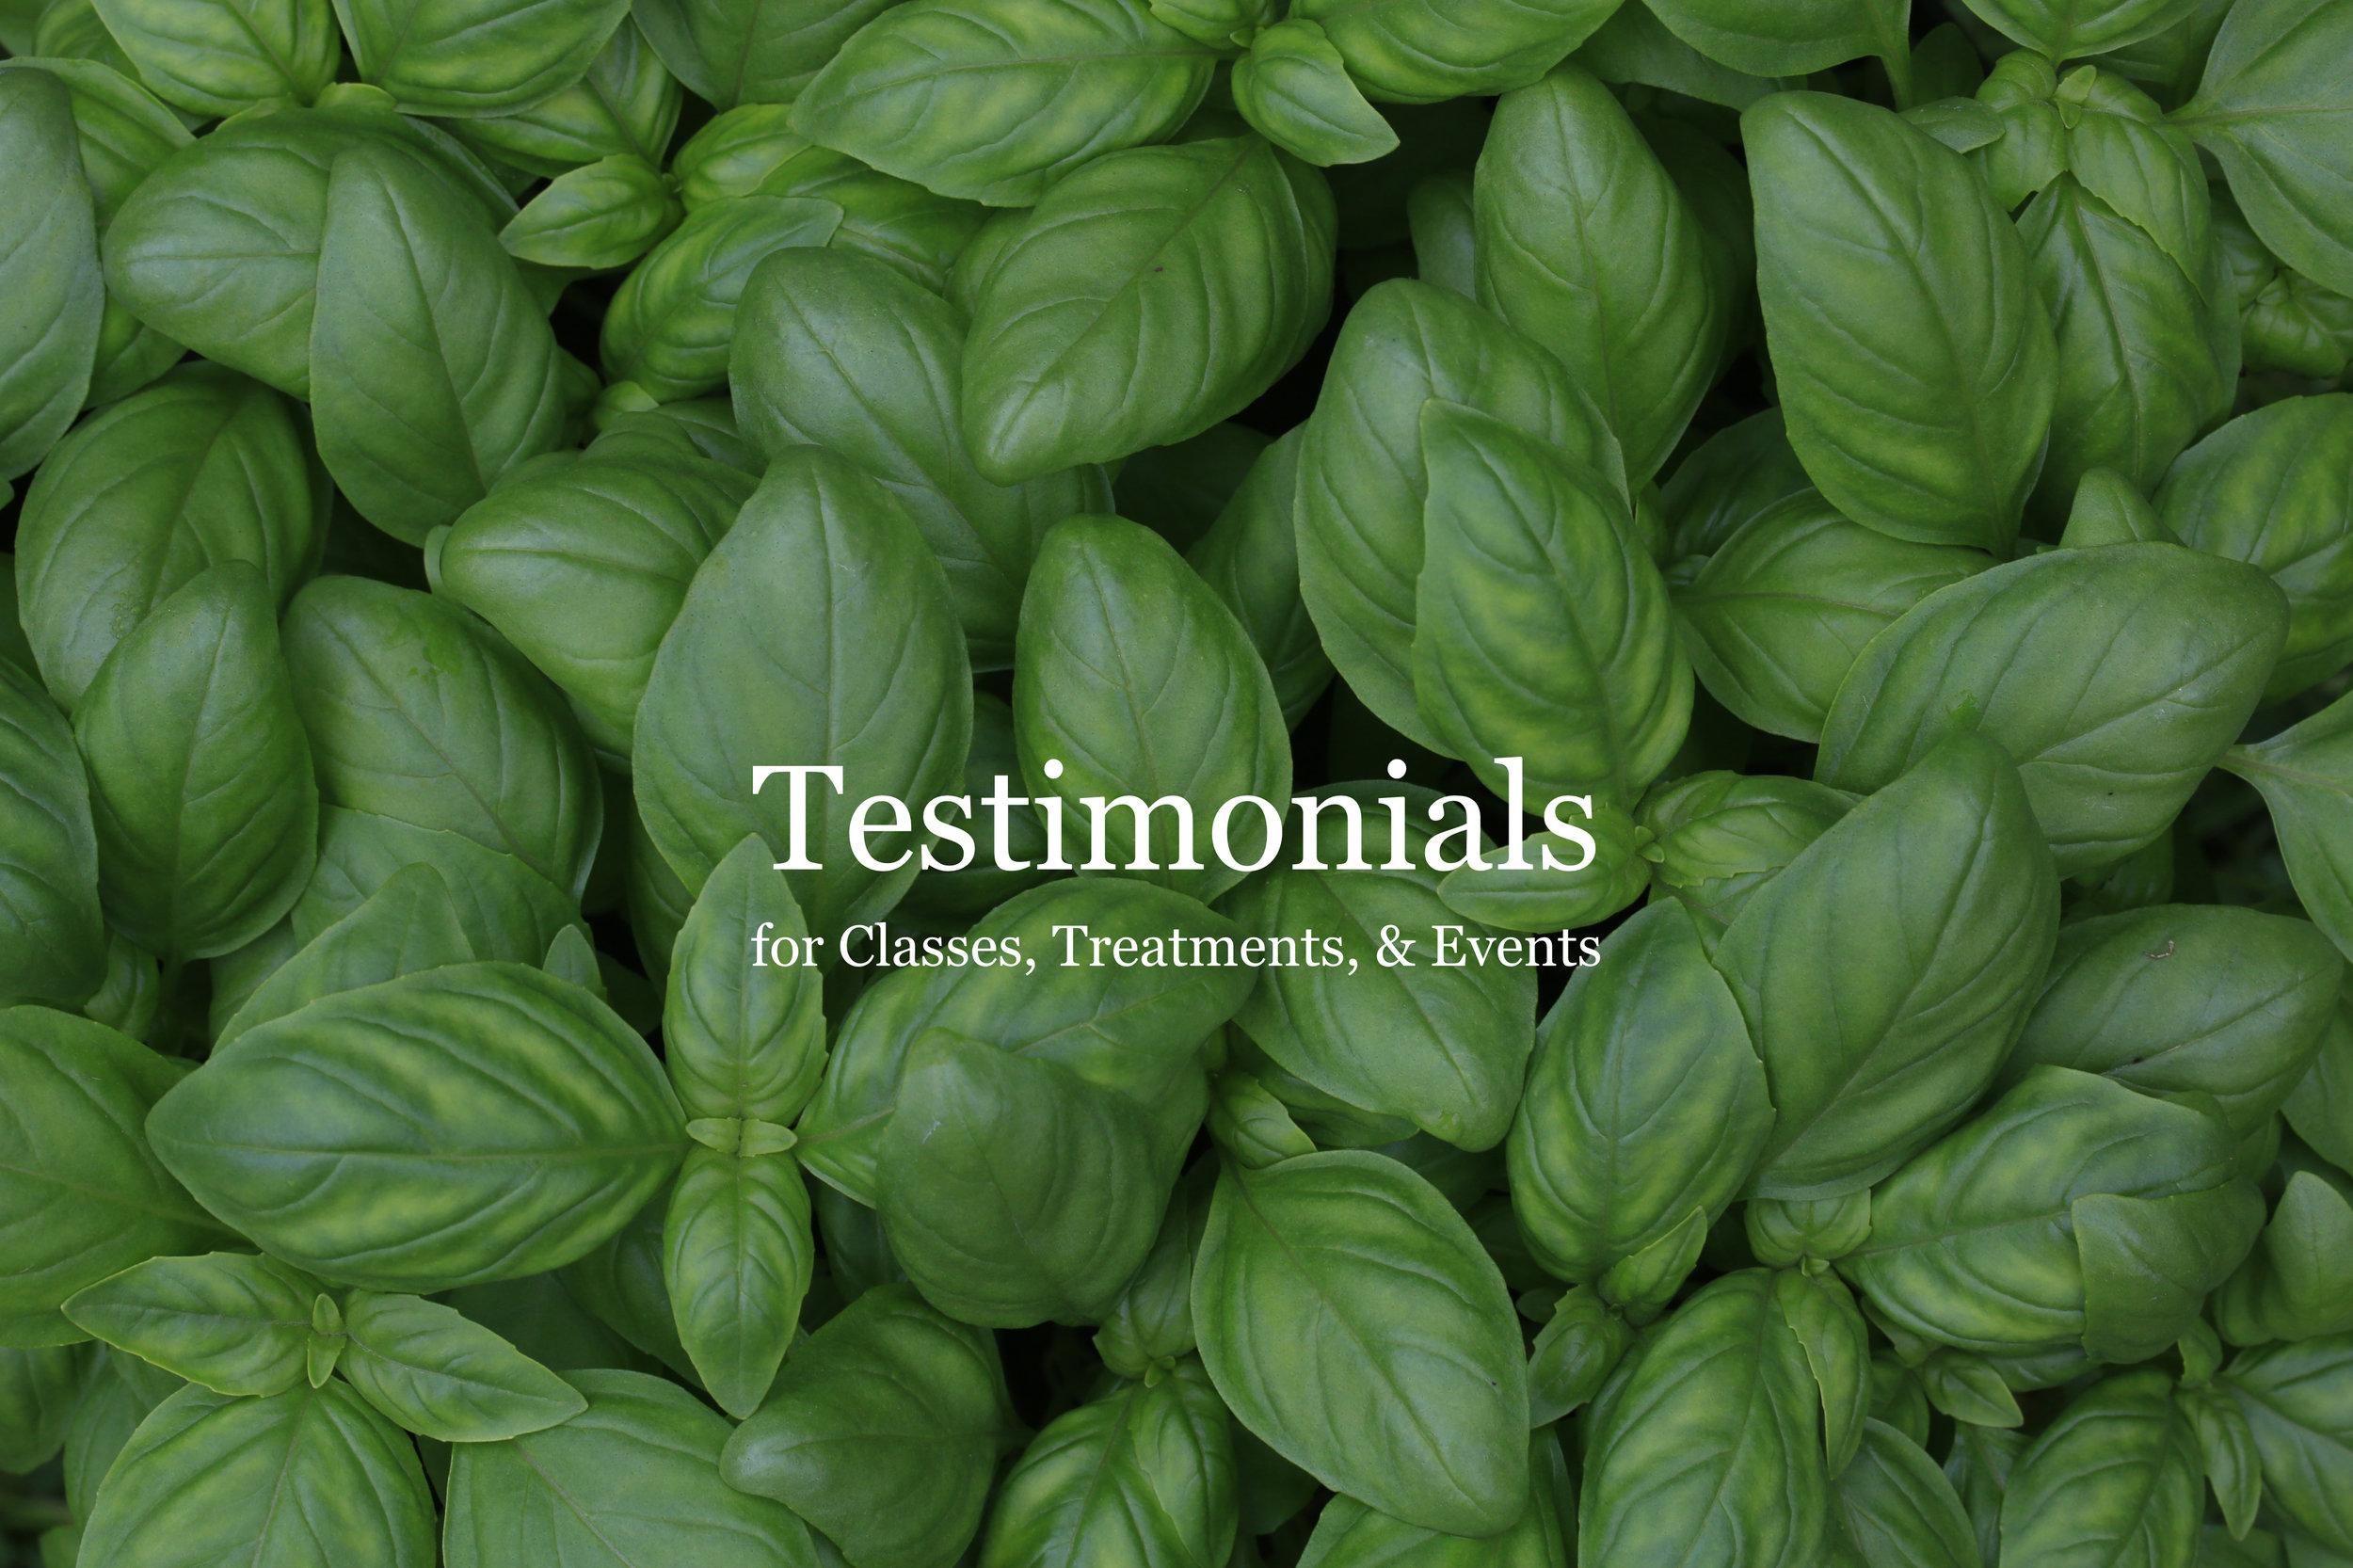 testimonials1.jpg